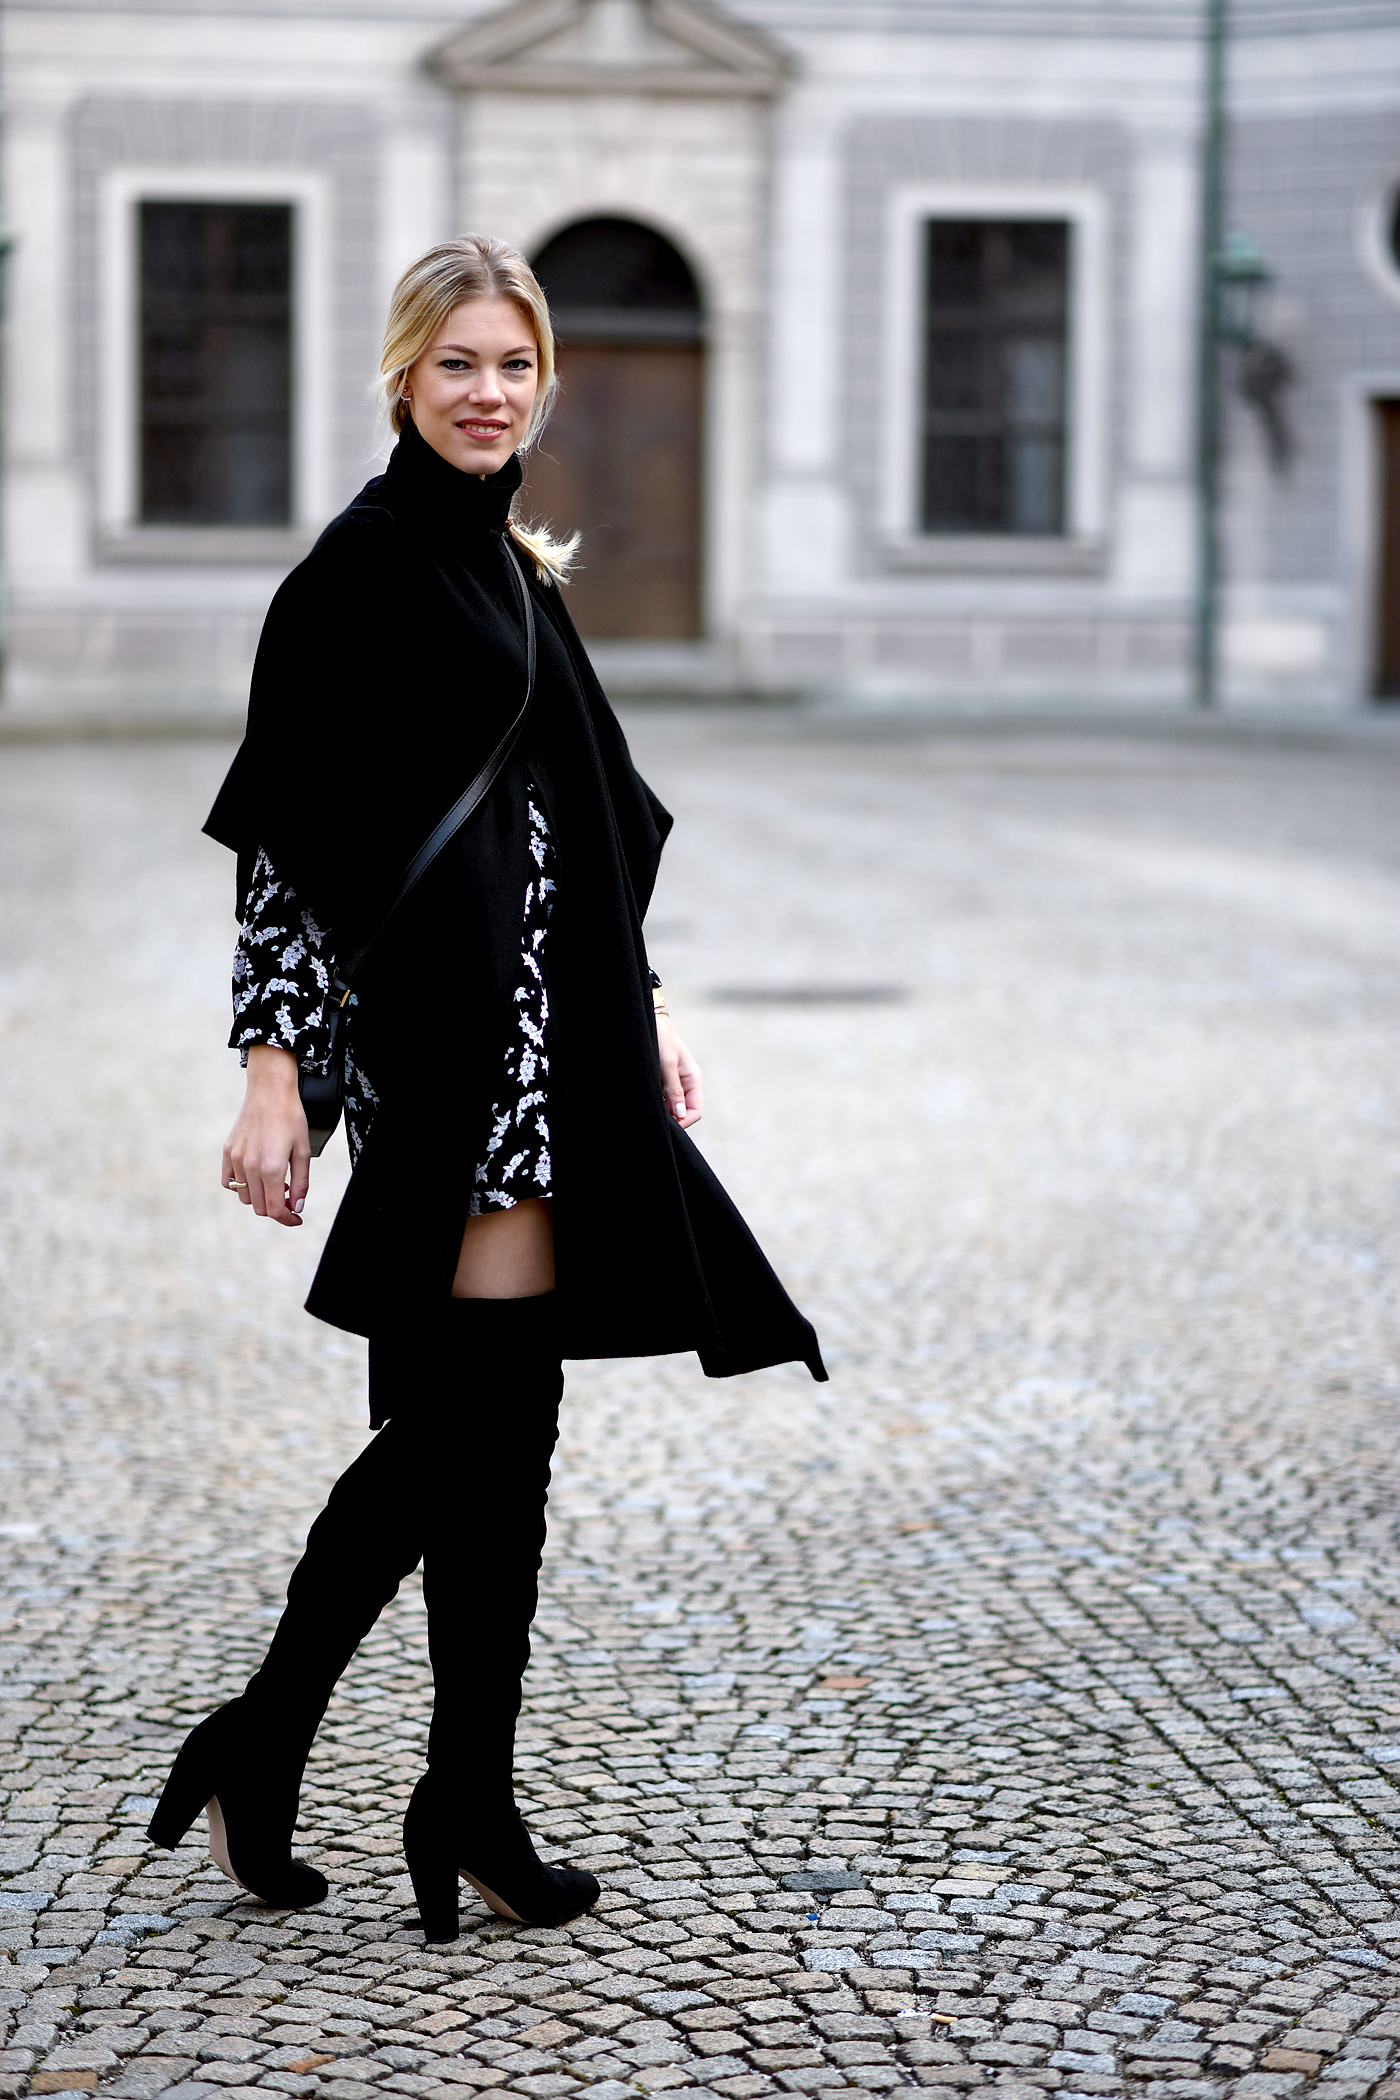 somehappyshoes_fashionblog_ganni_dress_overknees5